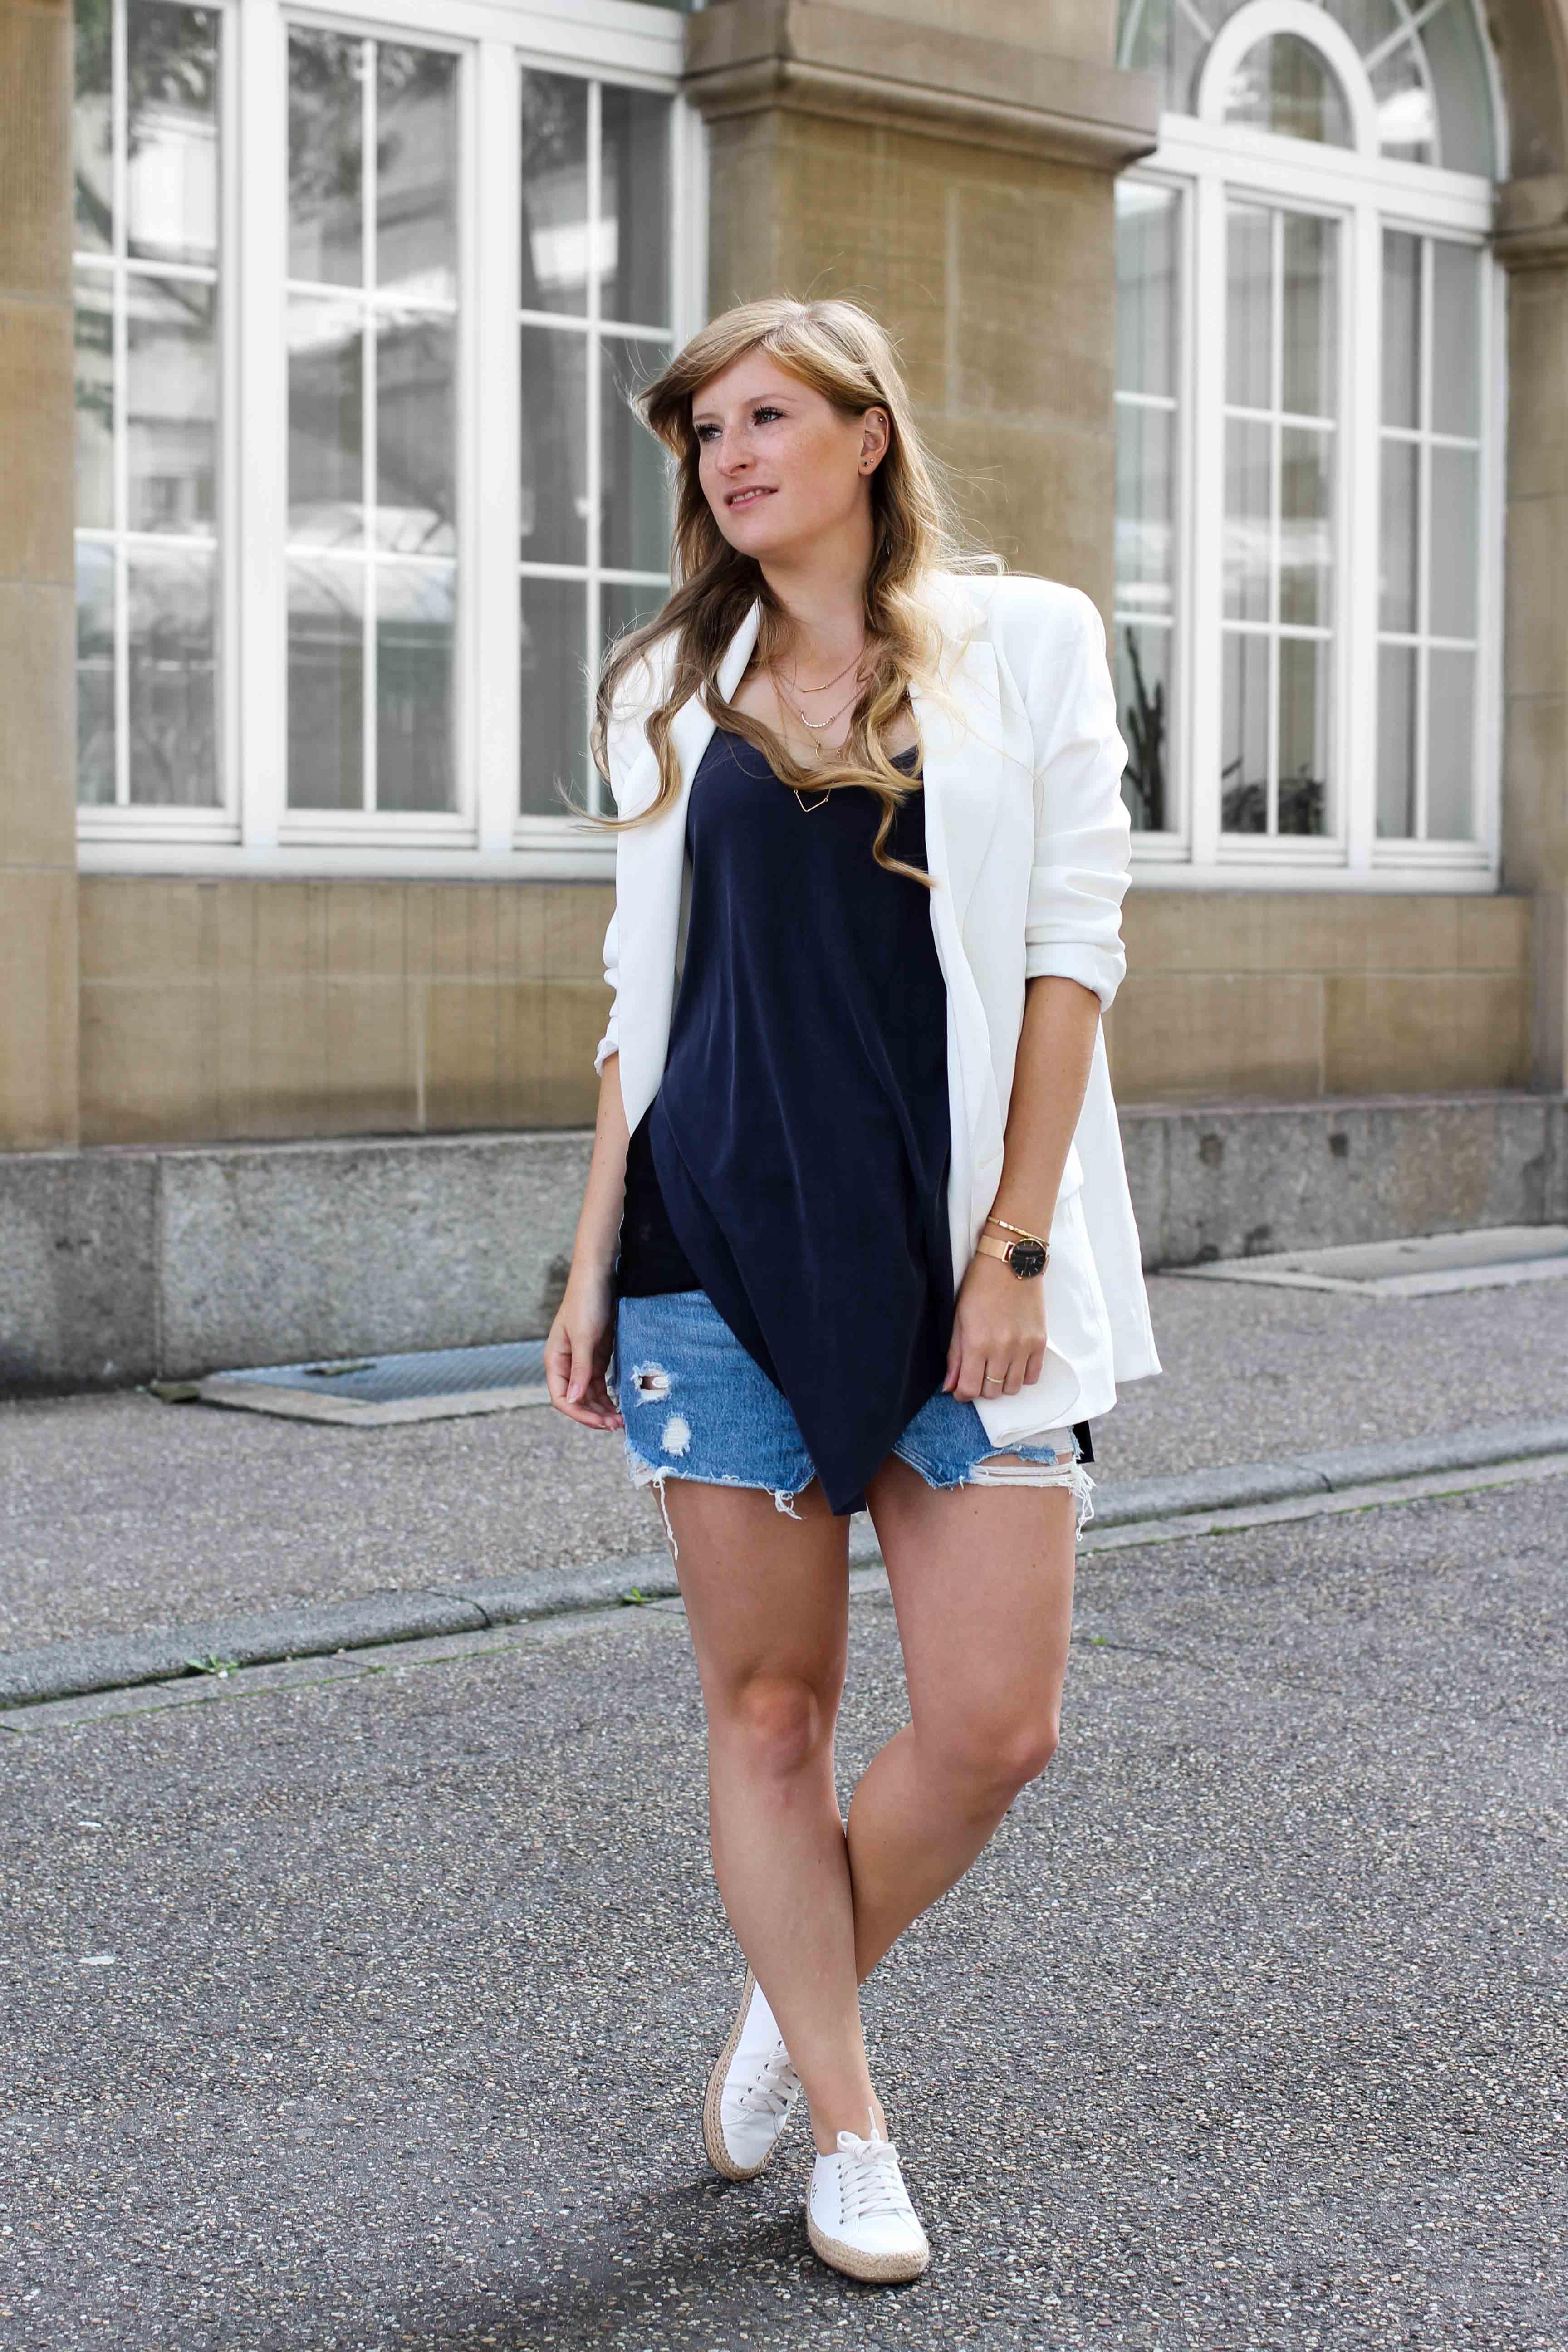 Spätsommeroutfit Zara Jeansrock kombinieren weißer Longblazer Zara weiße Sommerschuhe Modeblog Streetstyle Outfit Karlsruhe 11